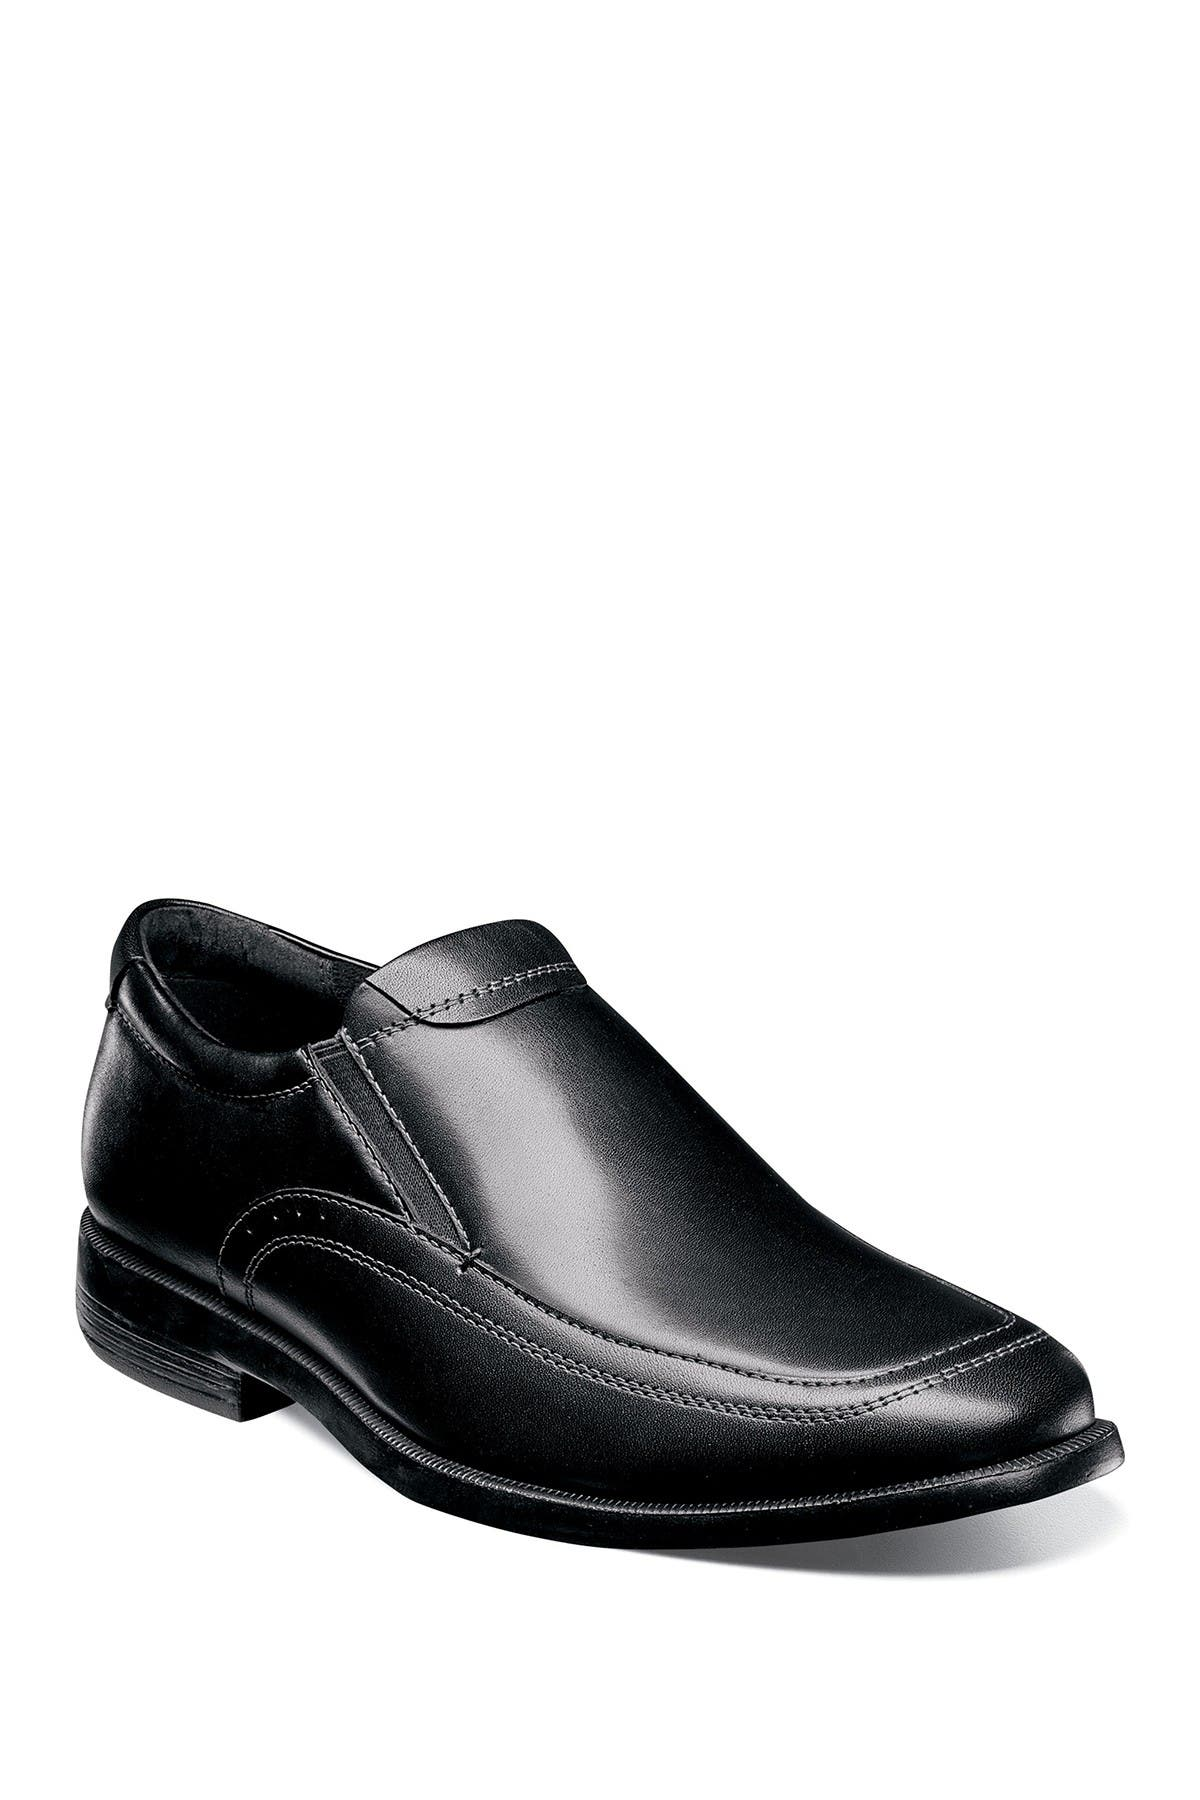 Image of NUNN BUSH Dylan Moc Toe Slip-On Loafer - Wide Width Available